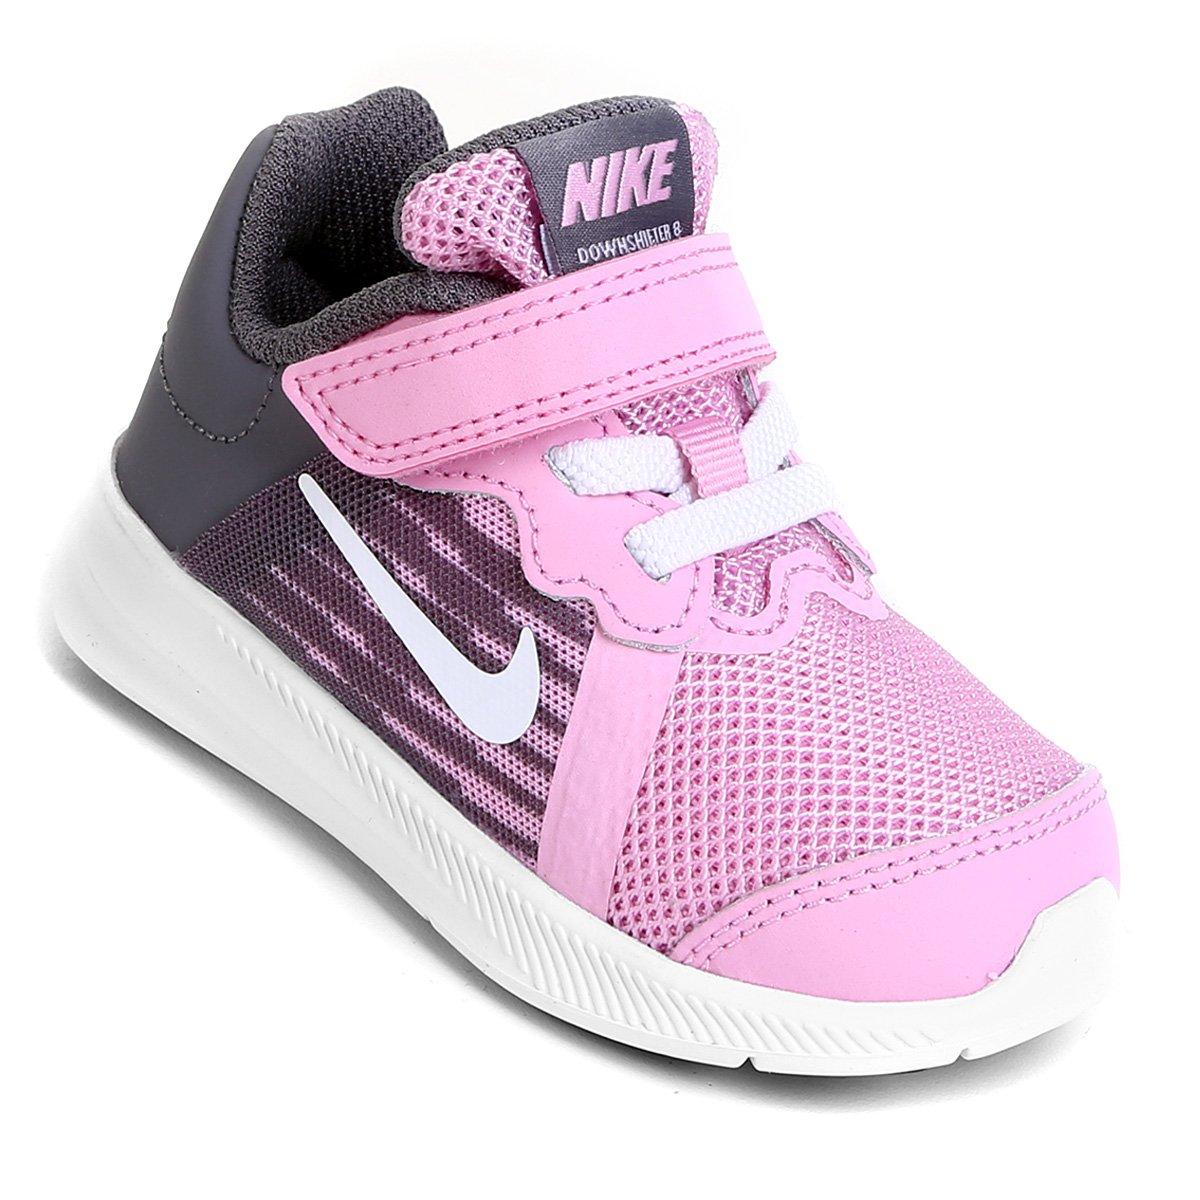 9b5d6b0c7c3 Tênis Infantil Nike Downshifter 8 Gtv Com Velcro Feminino